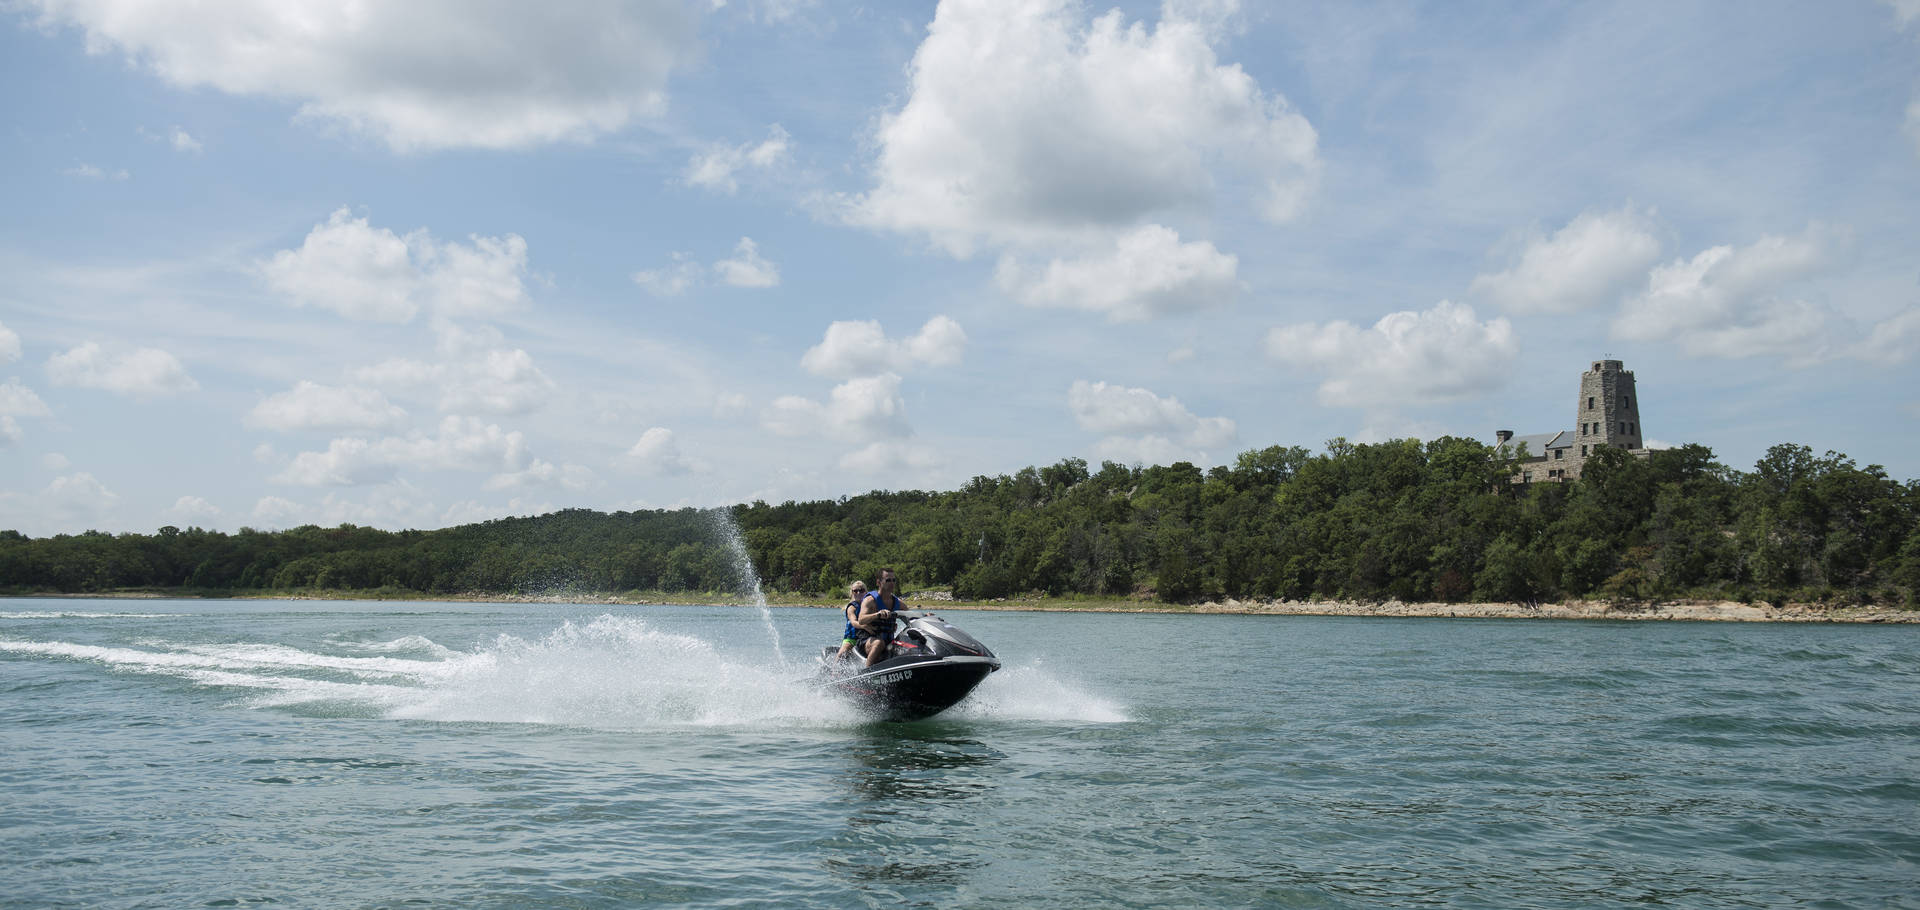 Oklahoma lakes and boating oklahoma 39 s for Oklahoma lake fishing reports